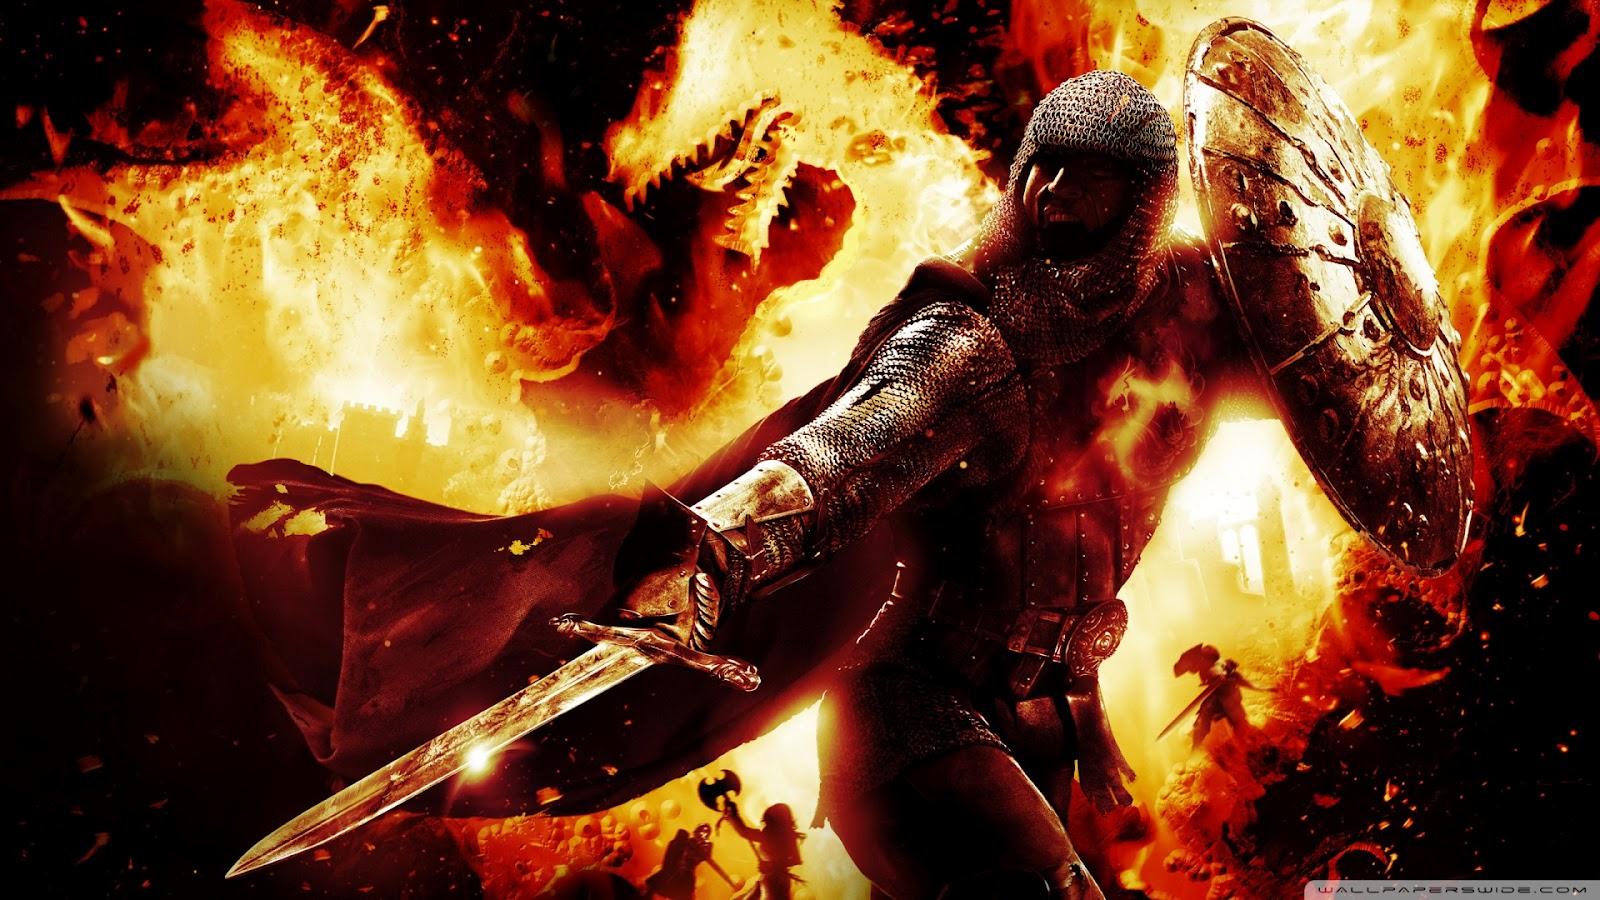 http://2.bp.blogspot.com/-ZDzPESG5rEQ/UFB2vXcxEDI/AAAAAAAADds/XEx1og3nX0I/s1600/dragons_dogma-wallpaper-1920x1080.jpg